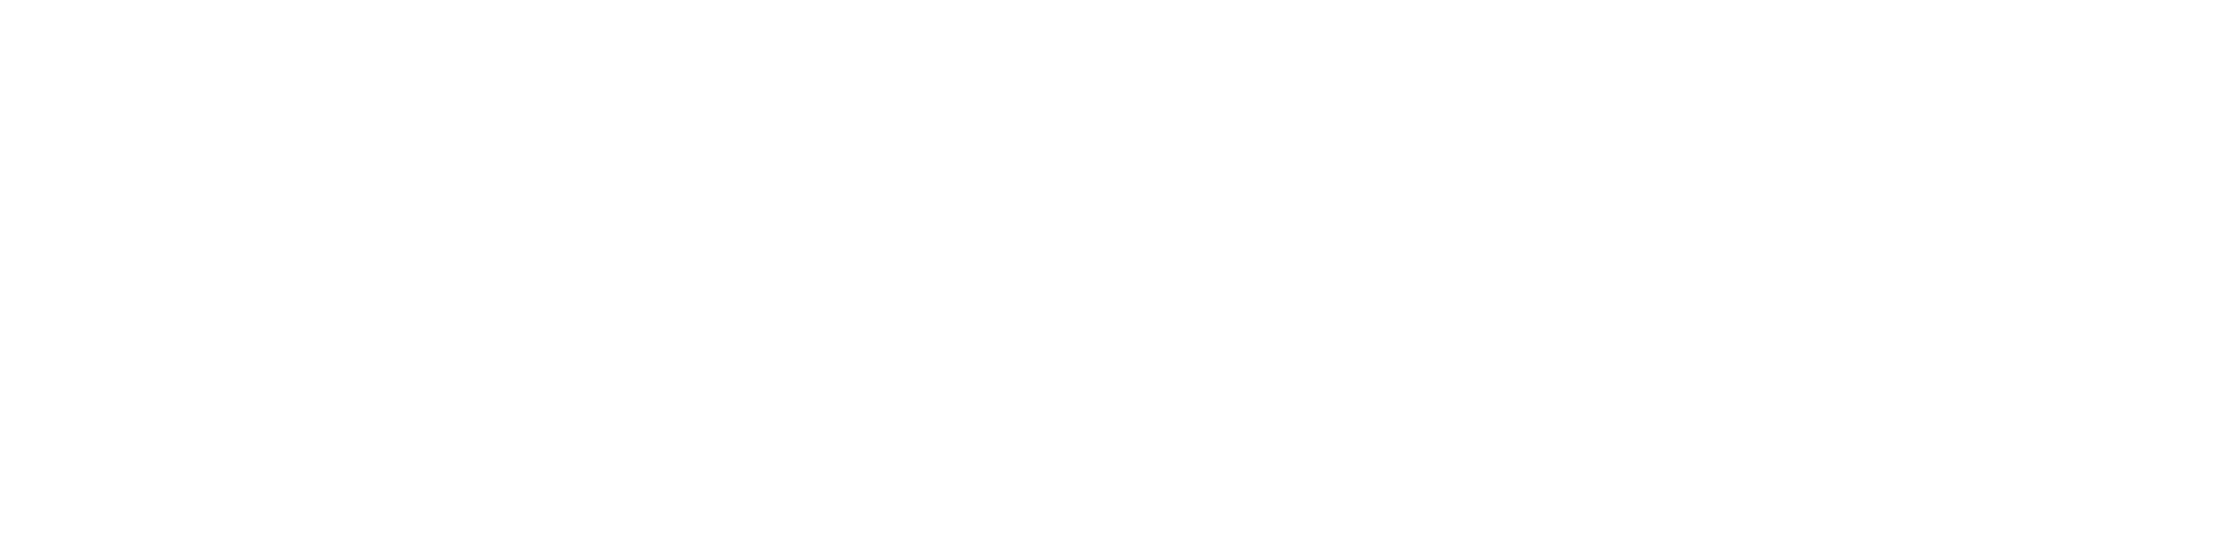 SucceedGroup_logo_white